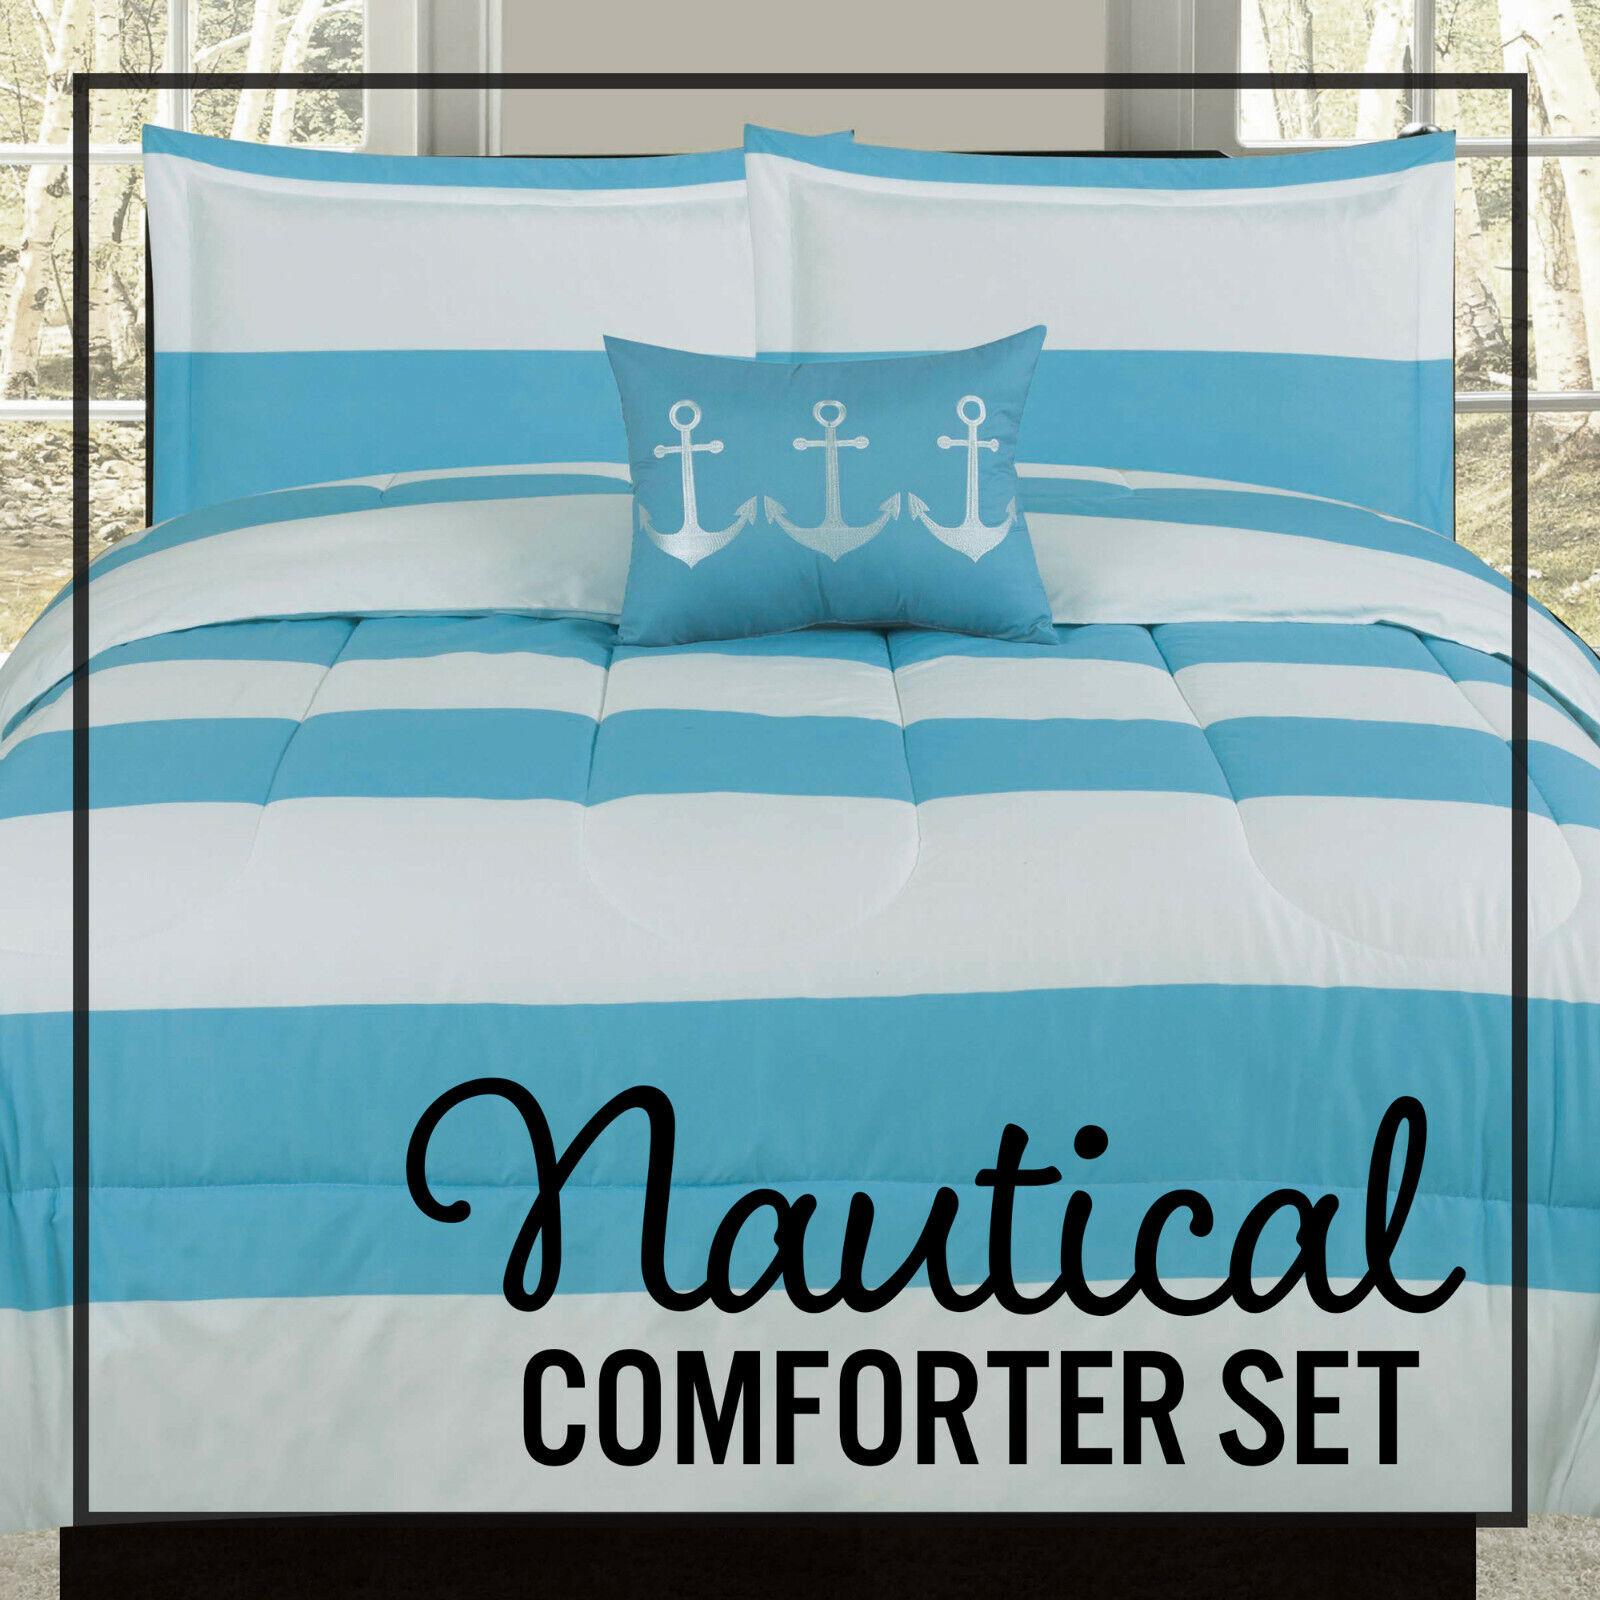 Twin Full/Queen or King Comforter Blue White Nautical Anchor Stripe Bedding Set Bedding